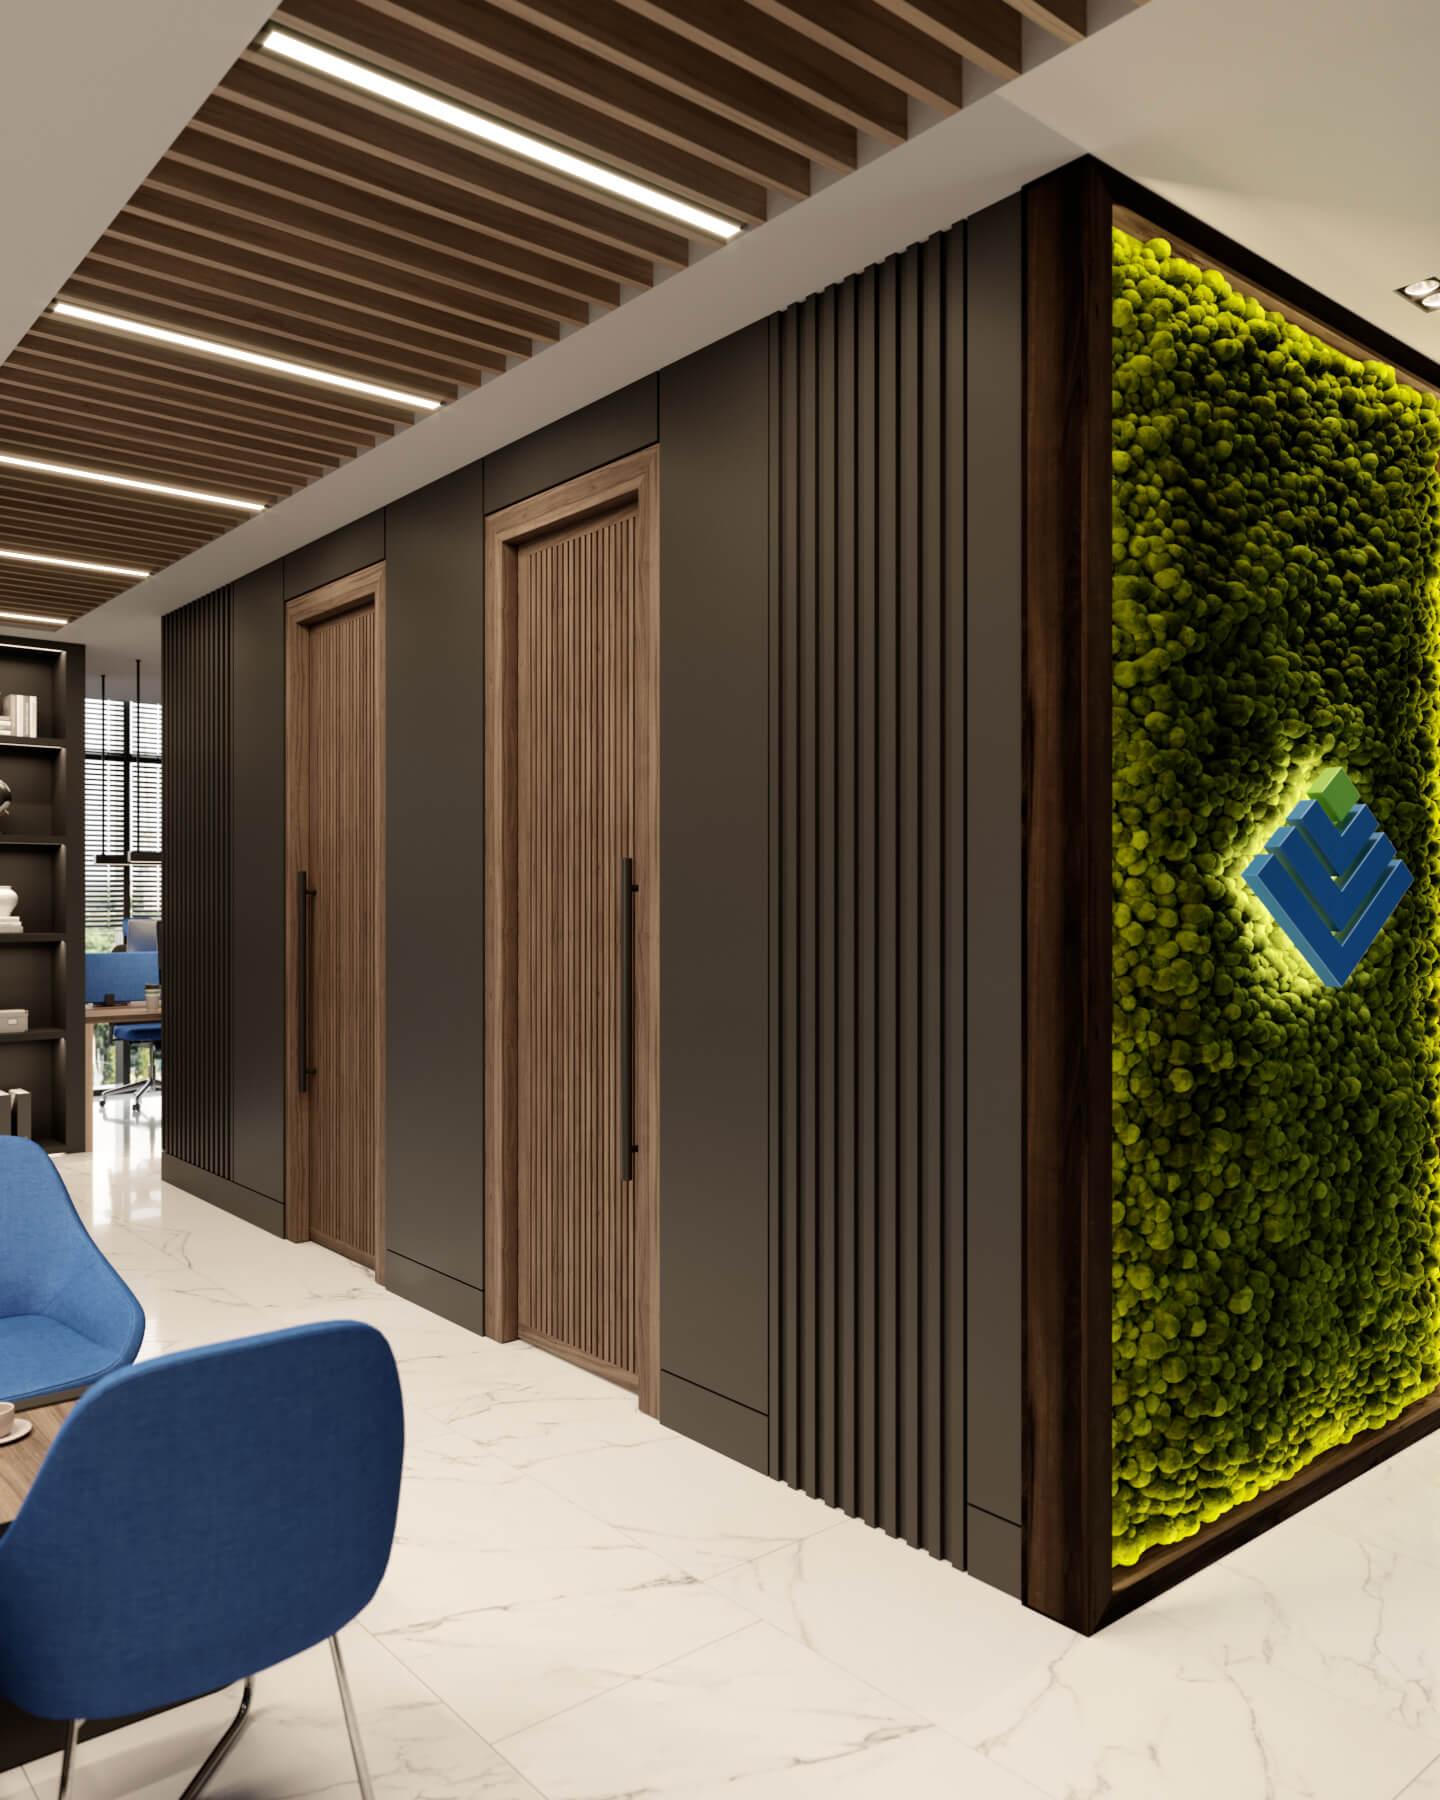 ofis mimari 4114 Anadolu Hayat Emeklilik Ofisler